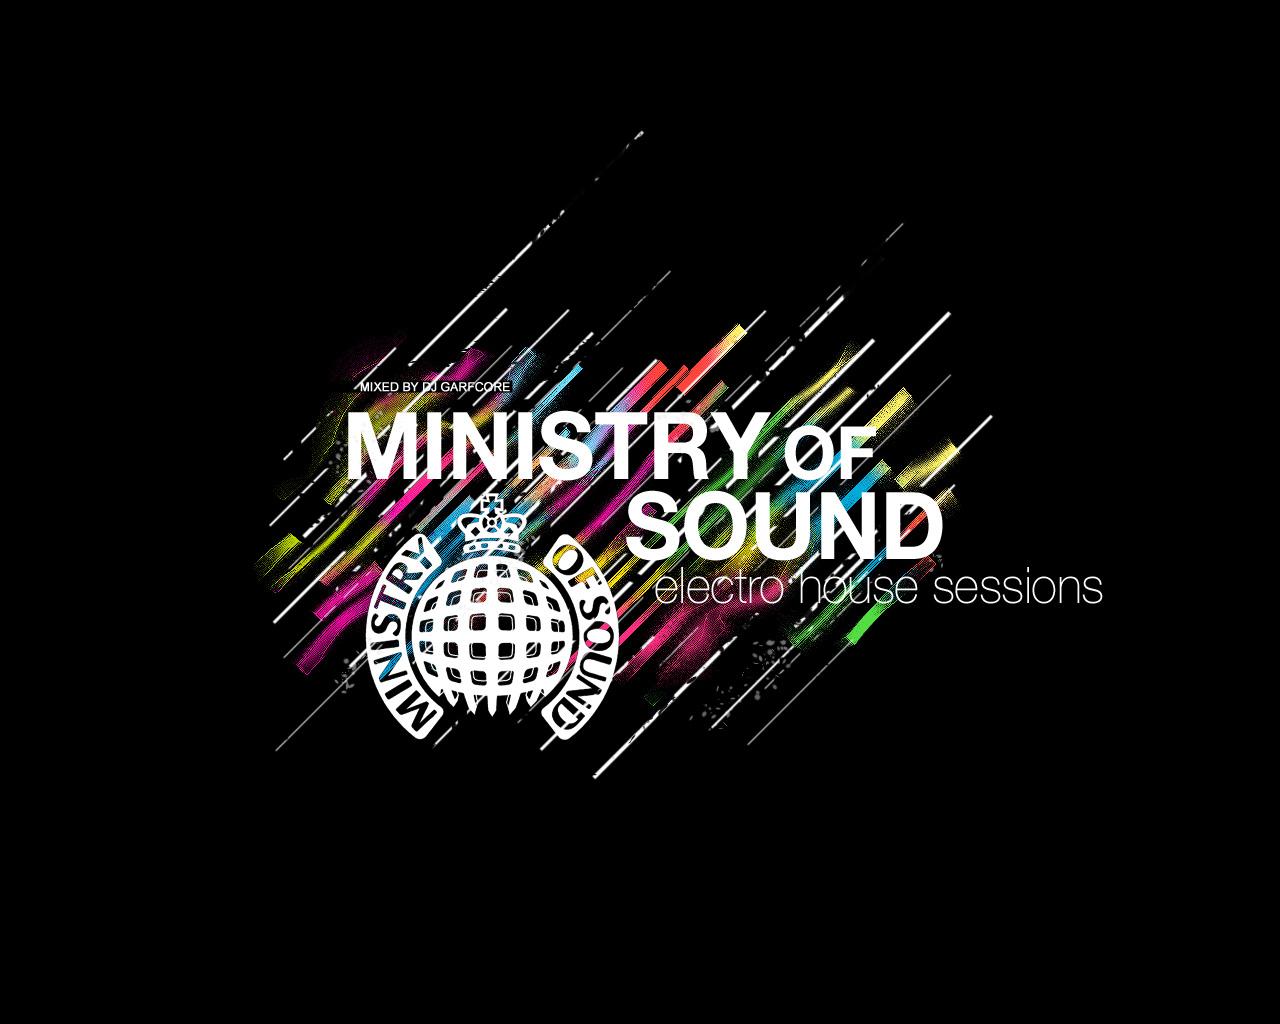 HD wallpaper Ministry Of Sound Wallpaper Desktop Music Hd HD 1280x1024